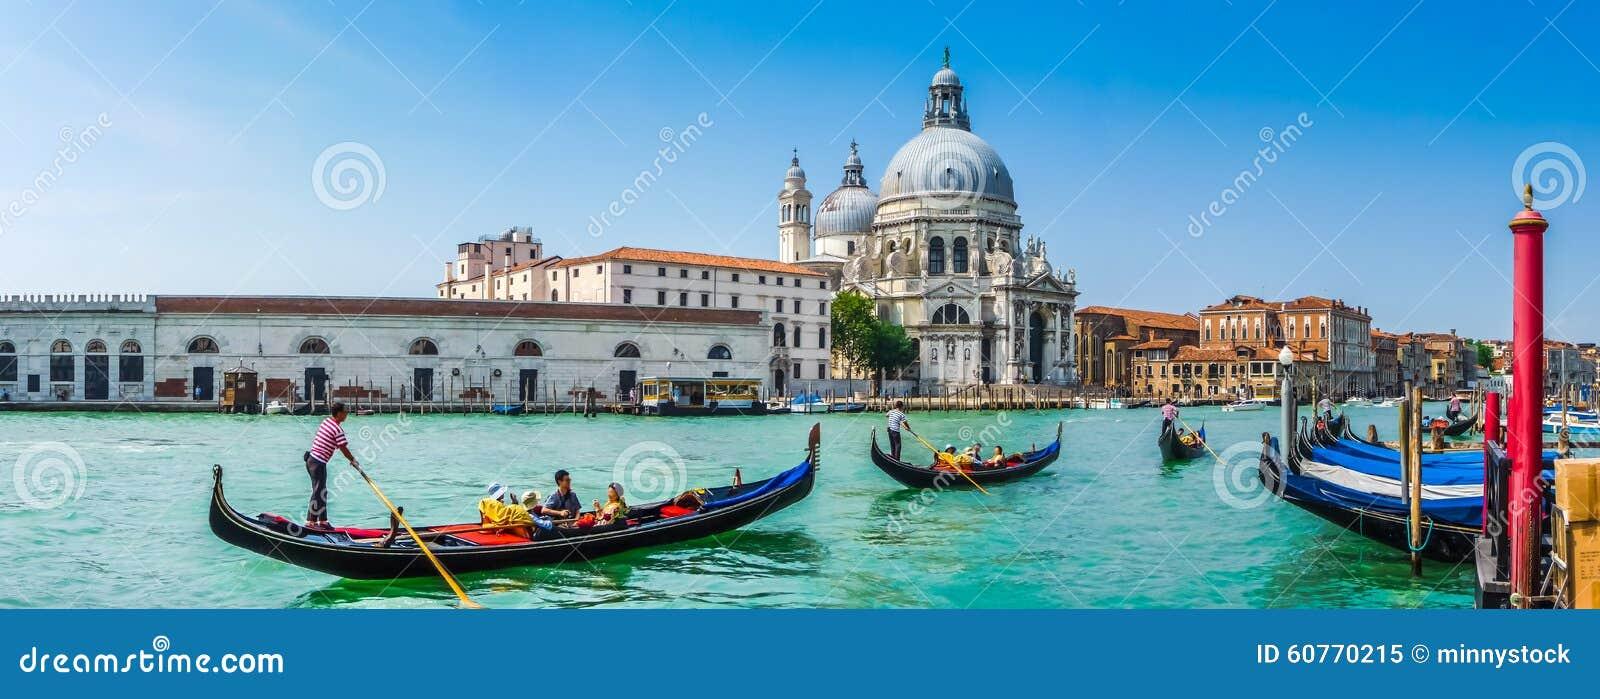 Gondeln auf dem Kanal groß mit Basilikadi Santa Maria, Venedig, Italien